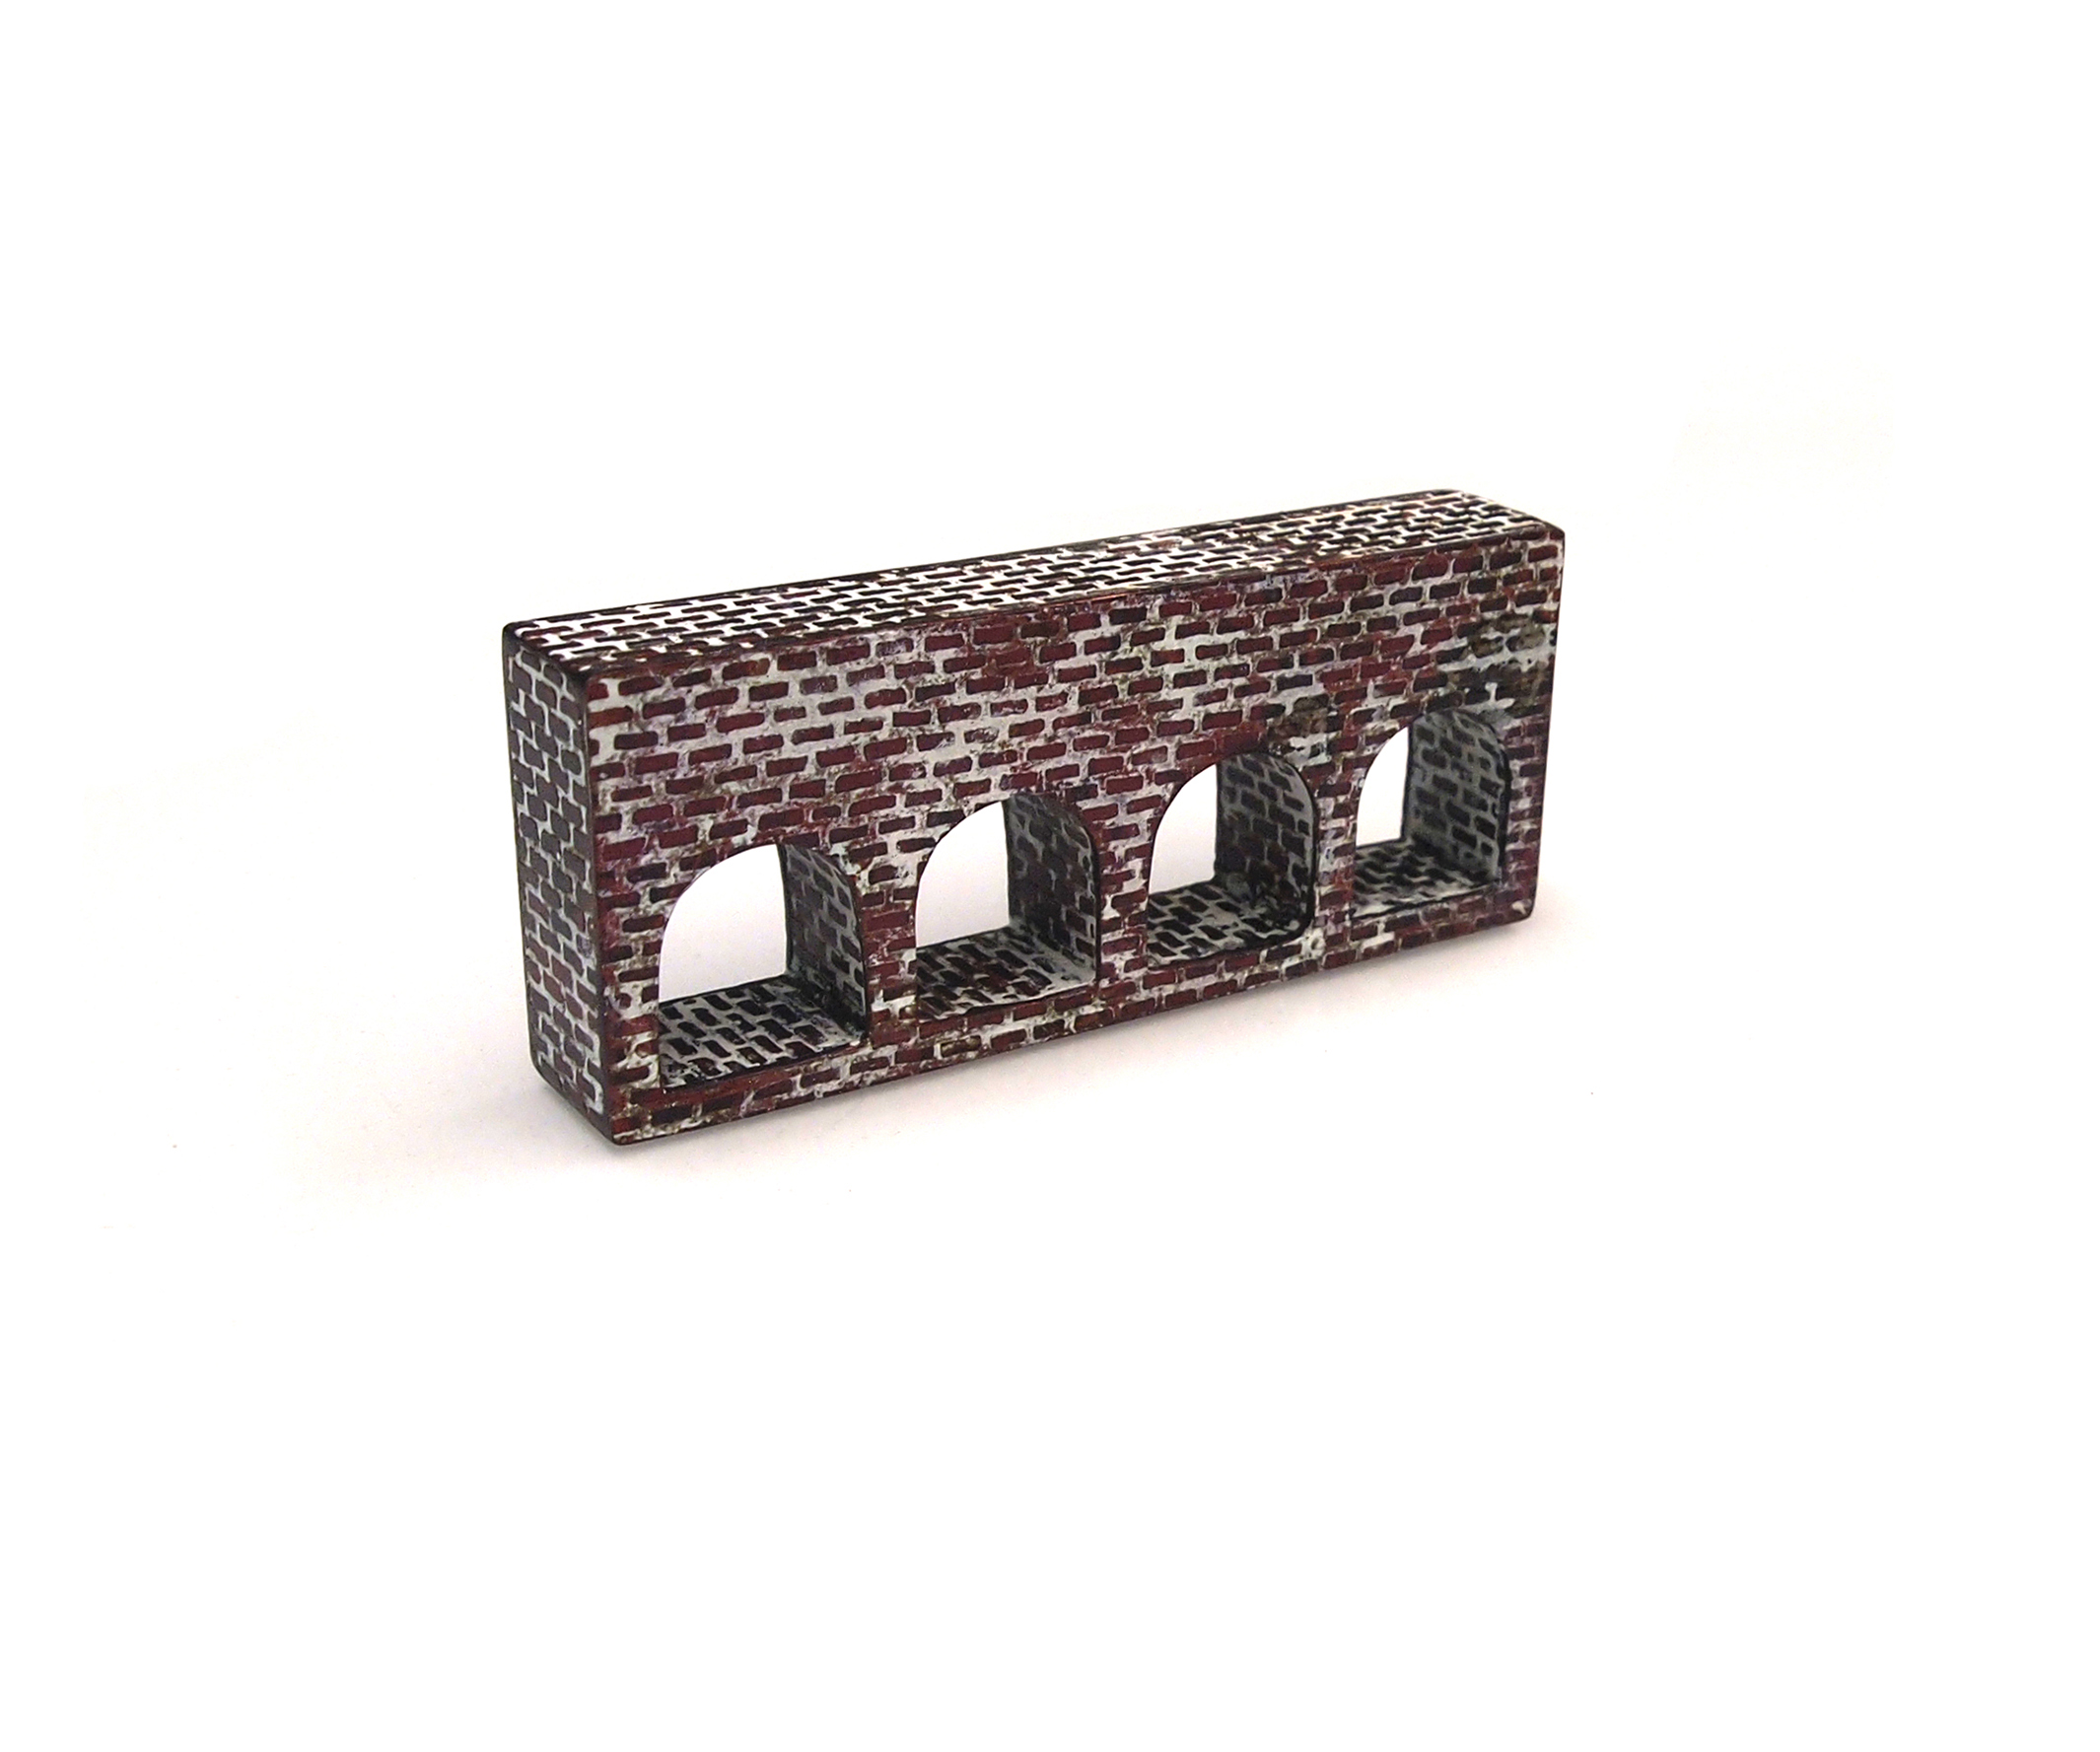 Massey_brickknuckles.jpg